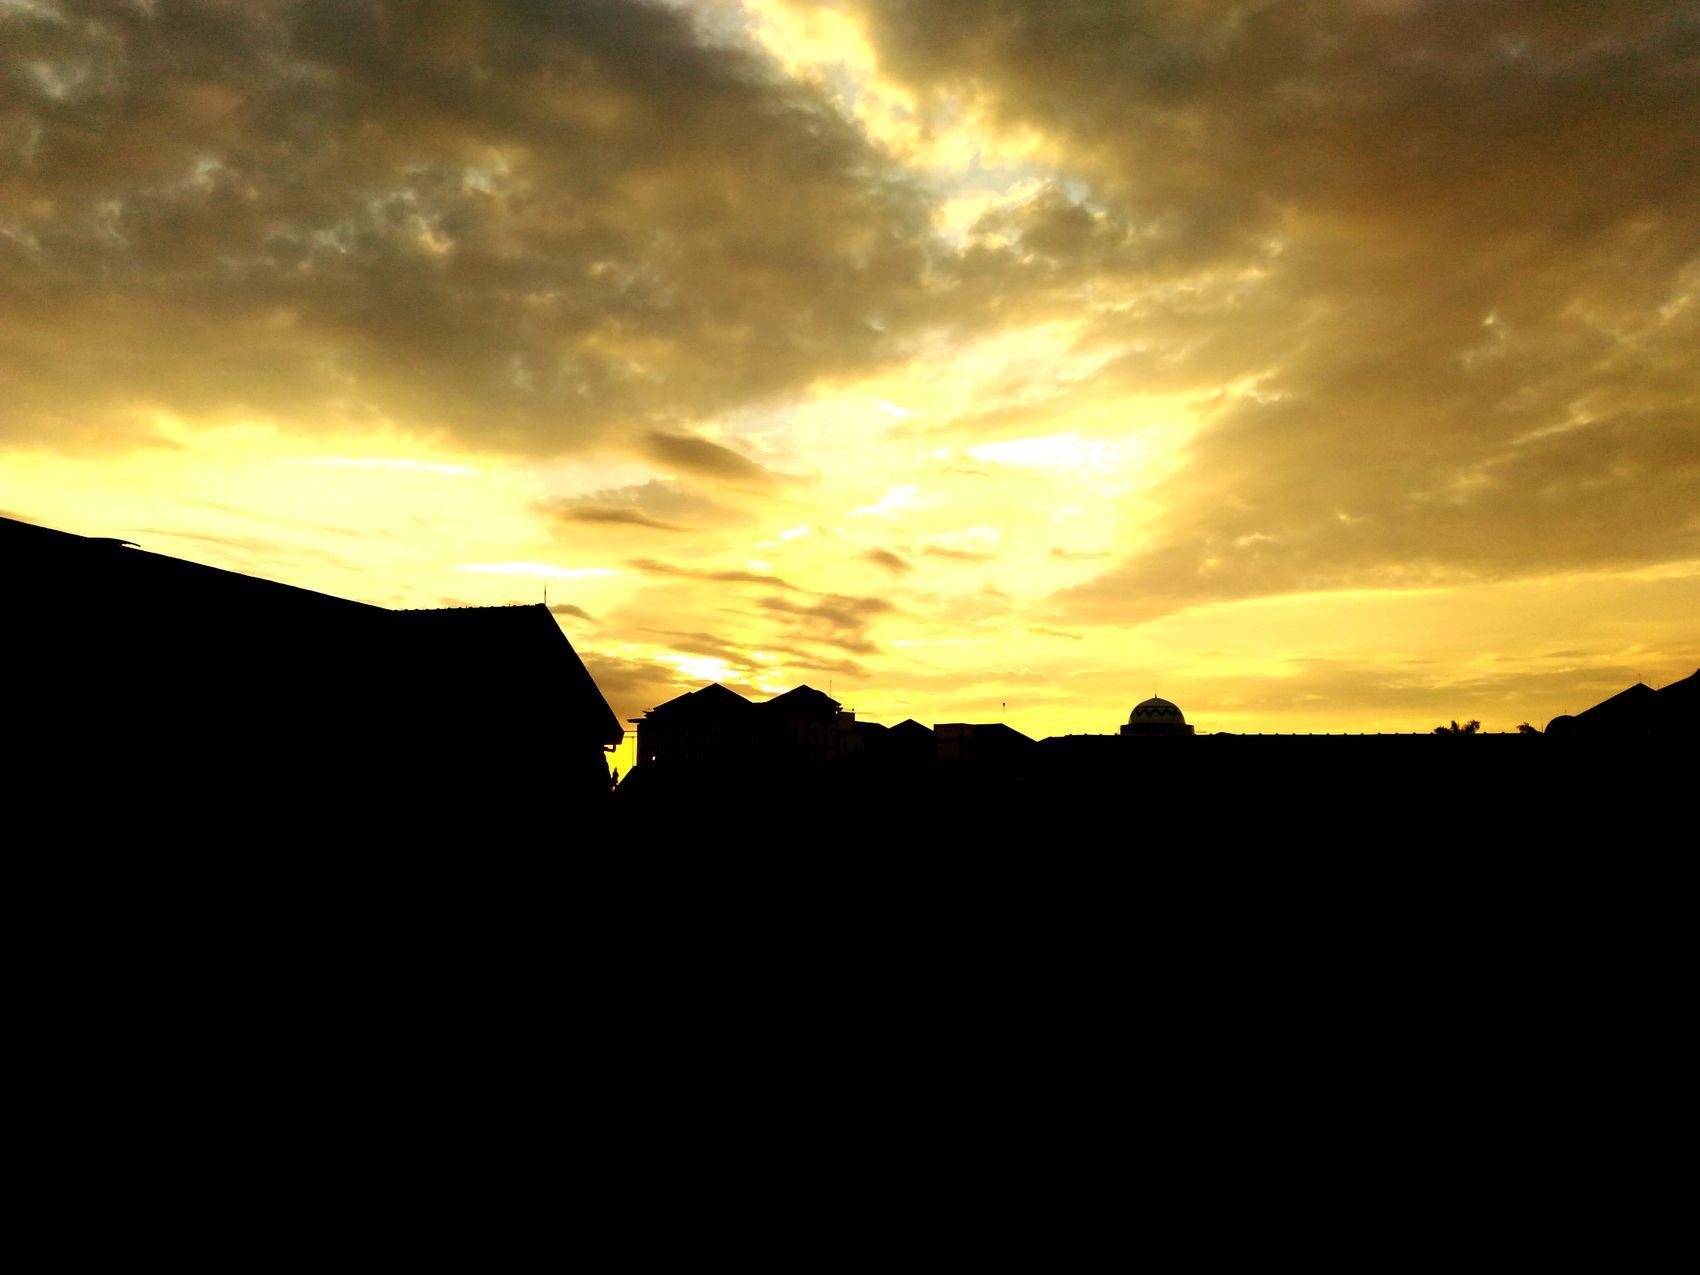 Another sunset Sunset #sun #clouds #skylovers #sky #nature #beautifulinnature #naturalbeauty #photography #landscape Nature Nature Photography Sunset And Clouds  Sunset